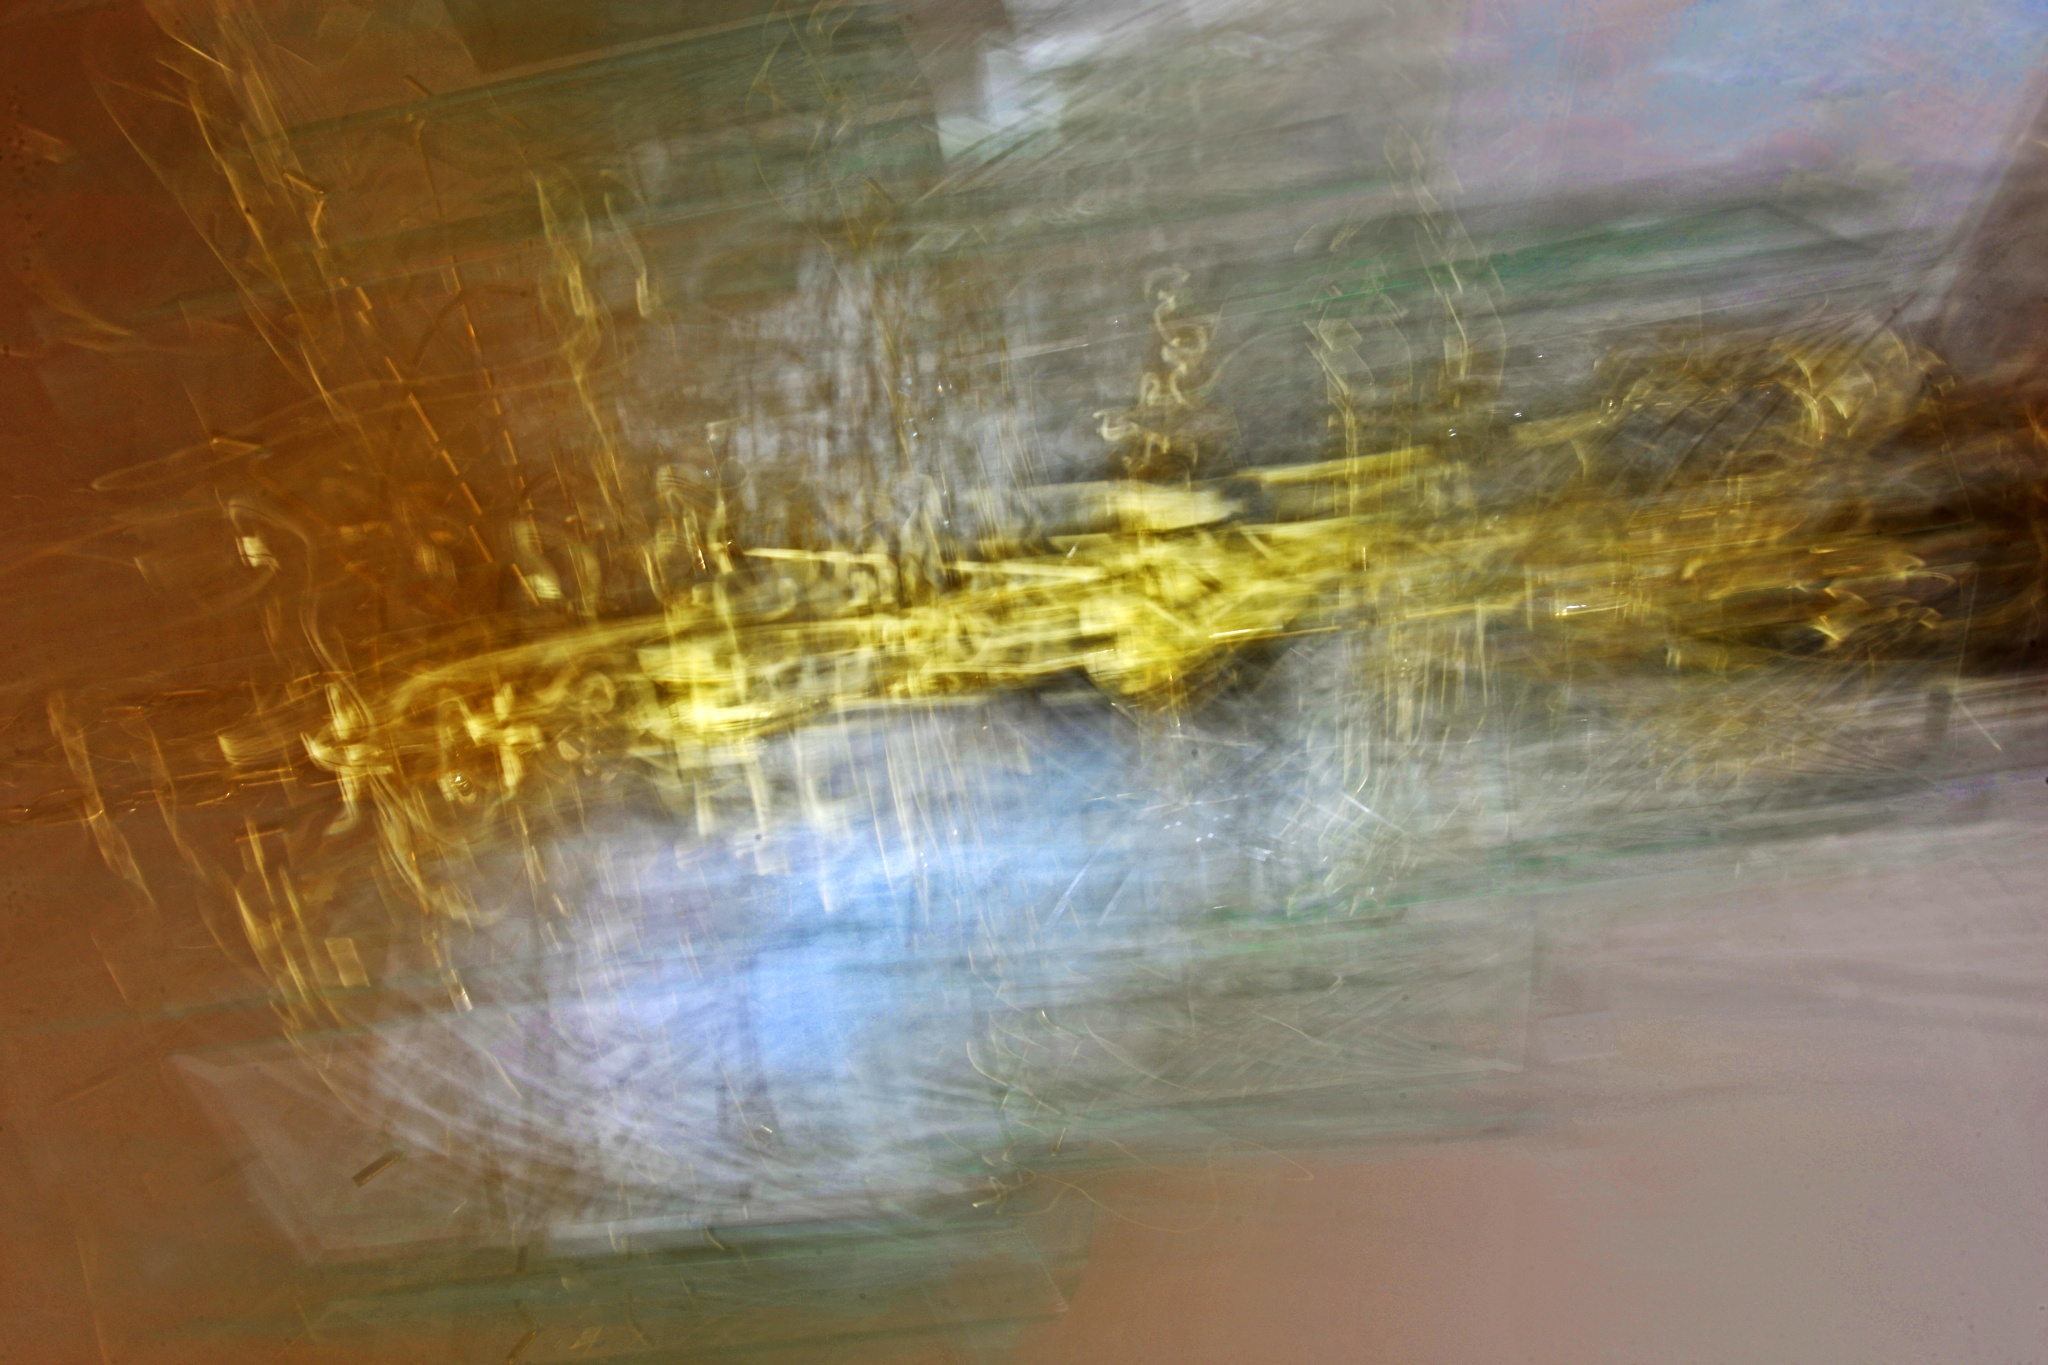 sideways light fixture by Todd Kamp